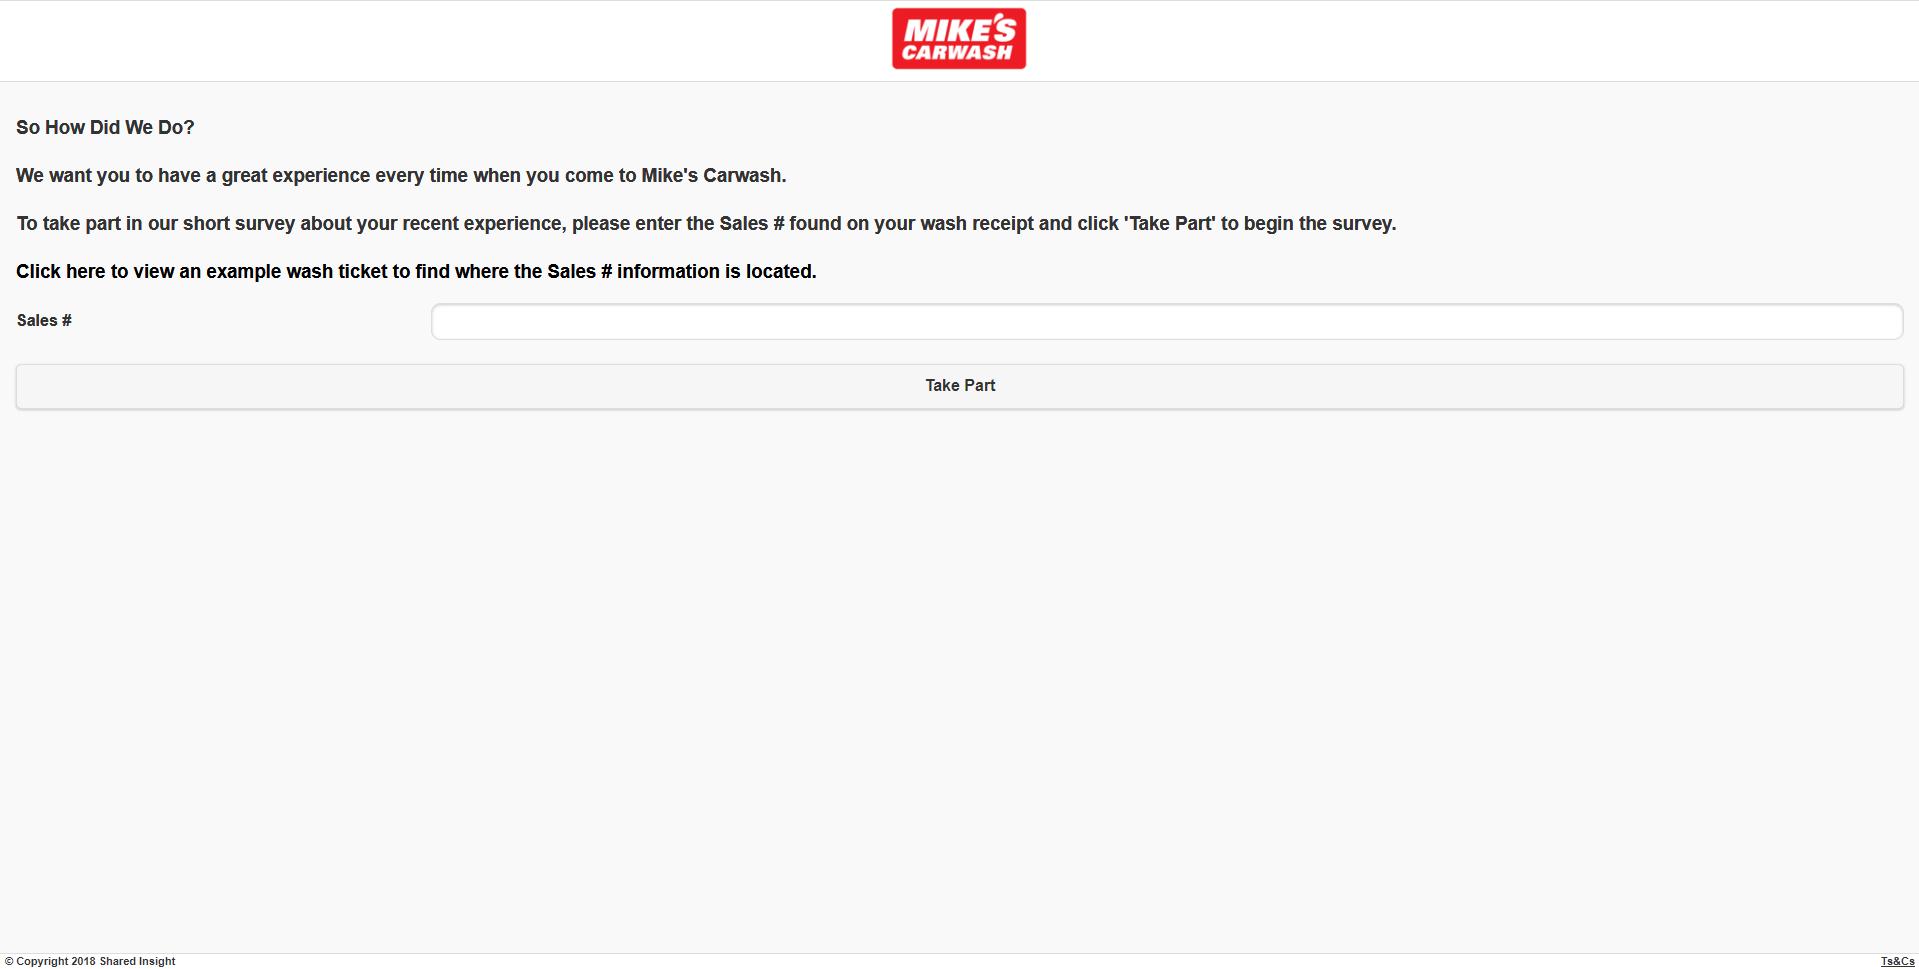 m.sharedinsight.com/survey/mikes/?lng=en